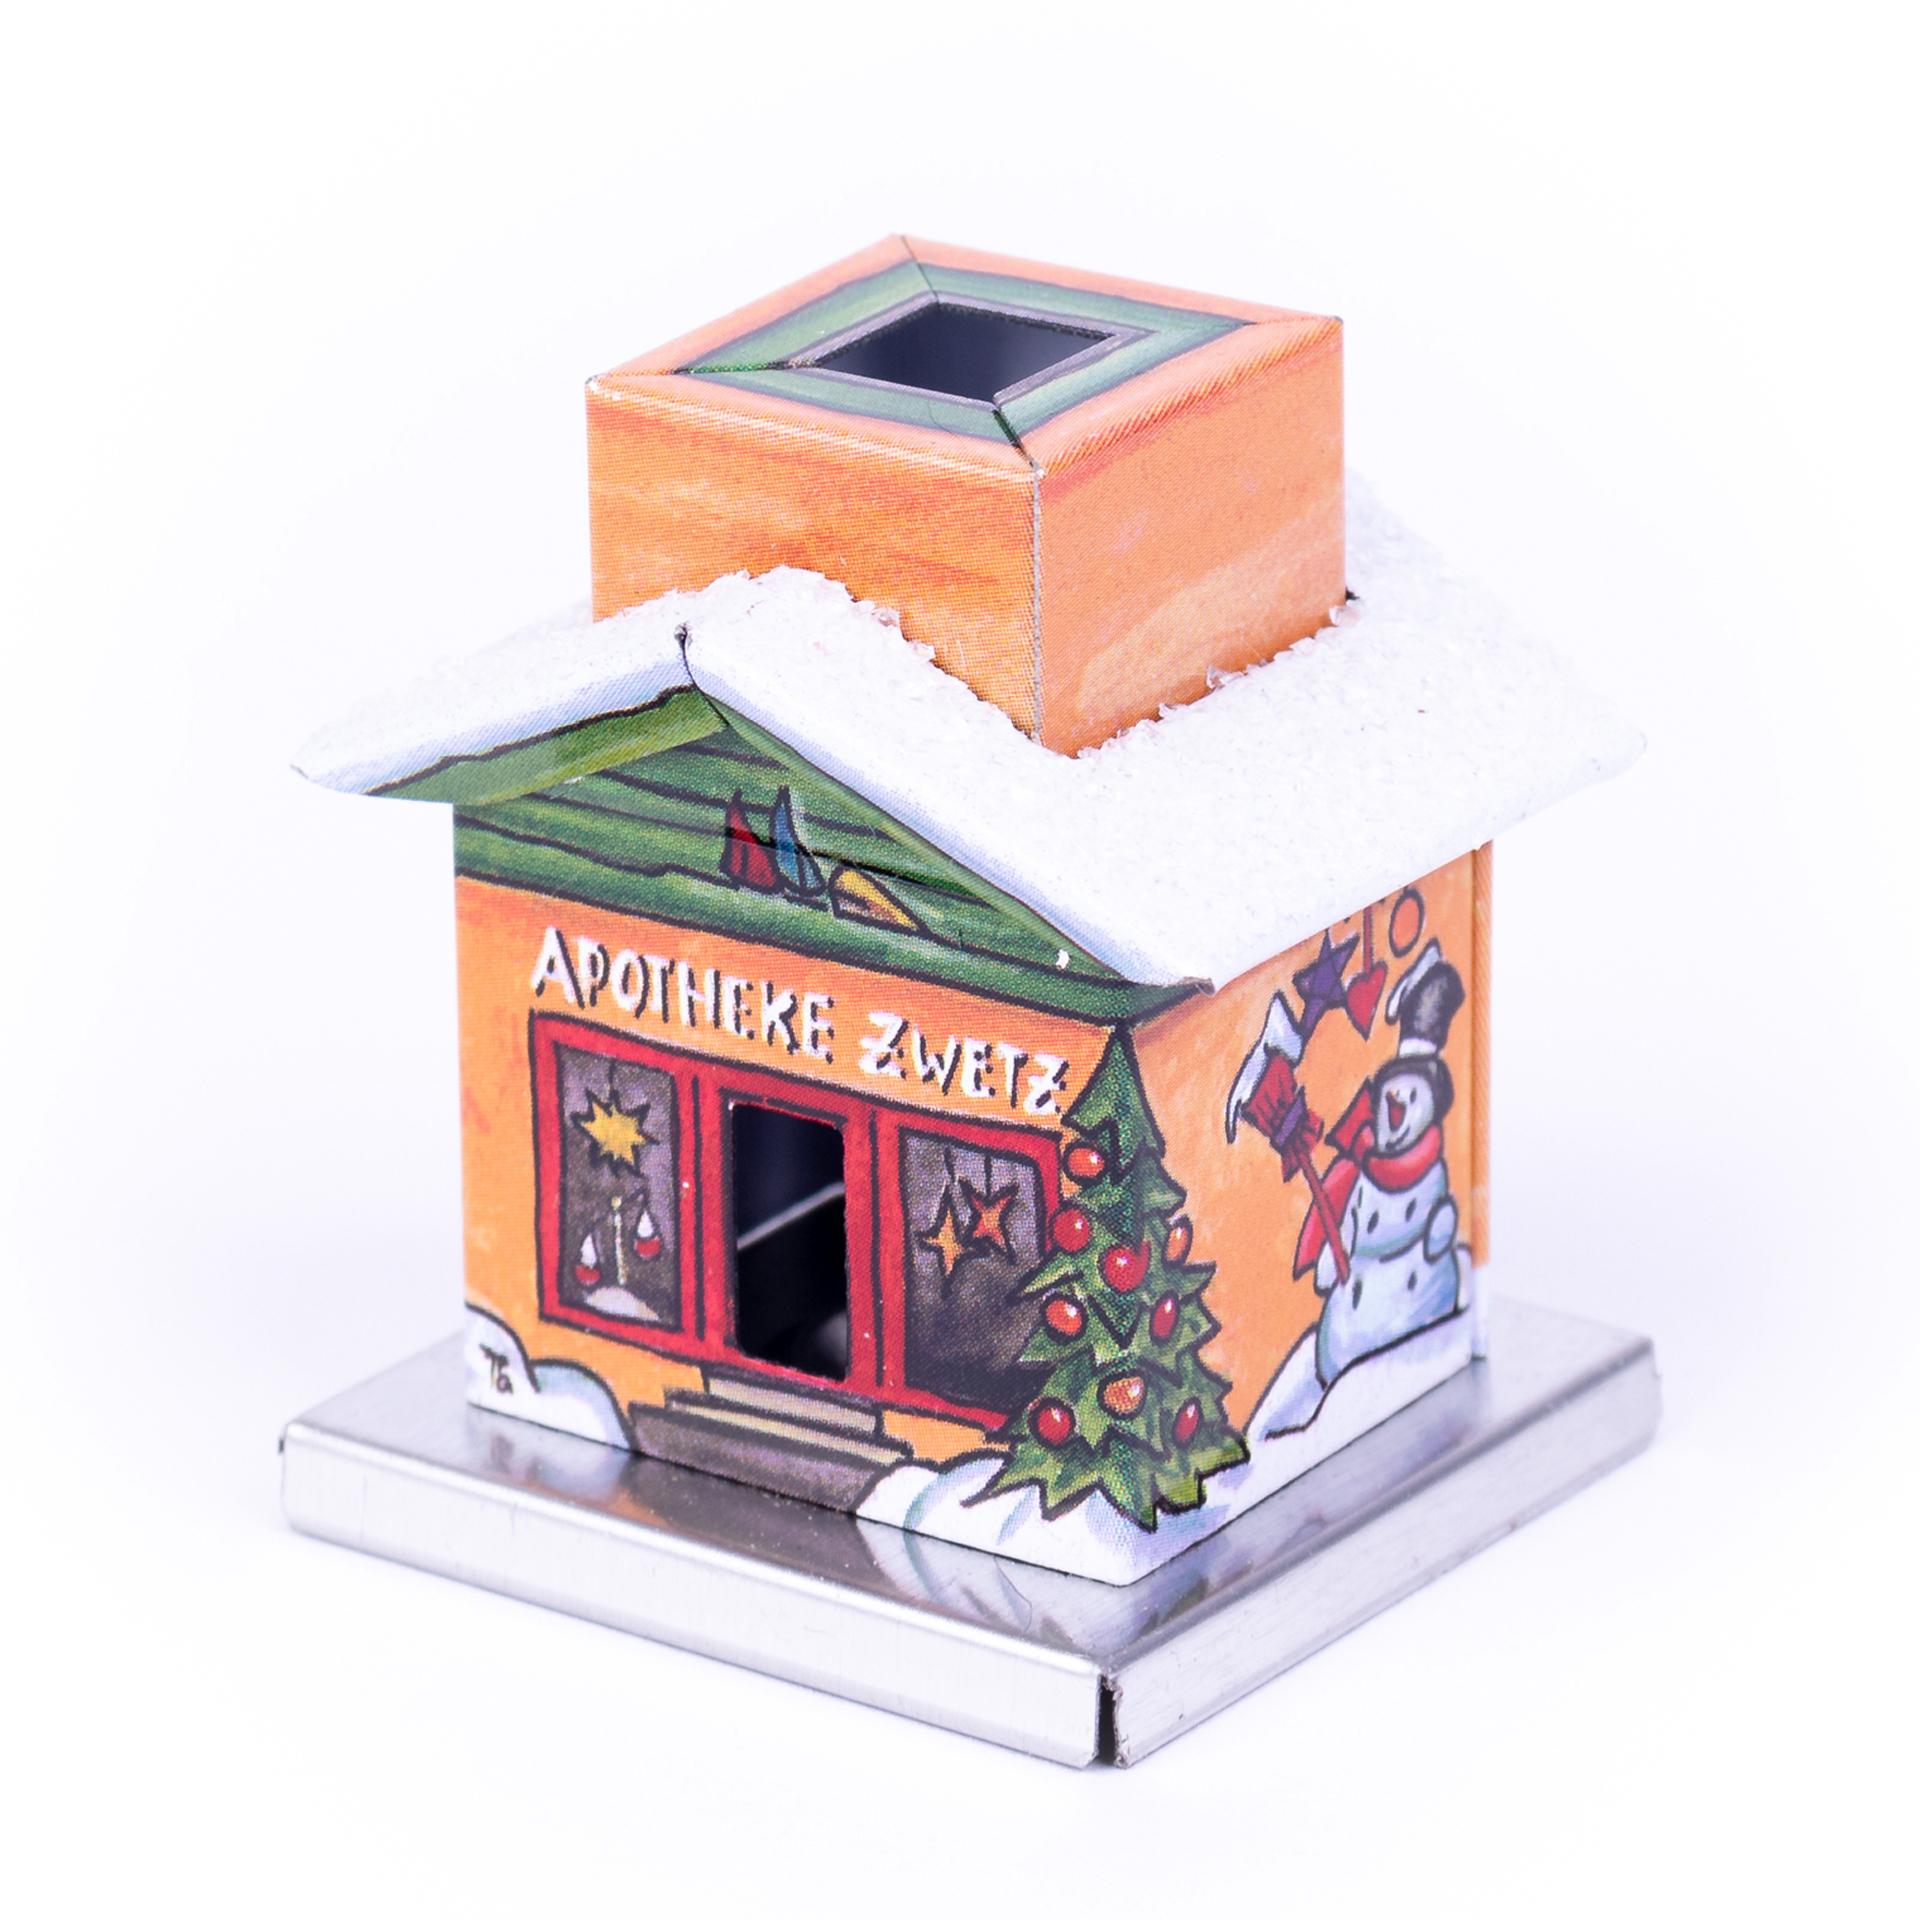 Rauchhaus Metall Mini Apotheke